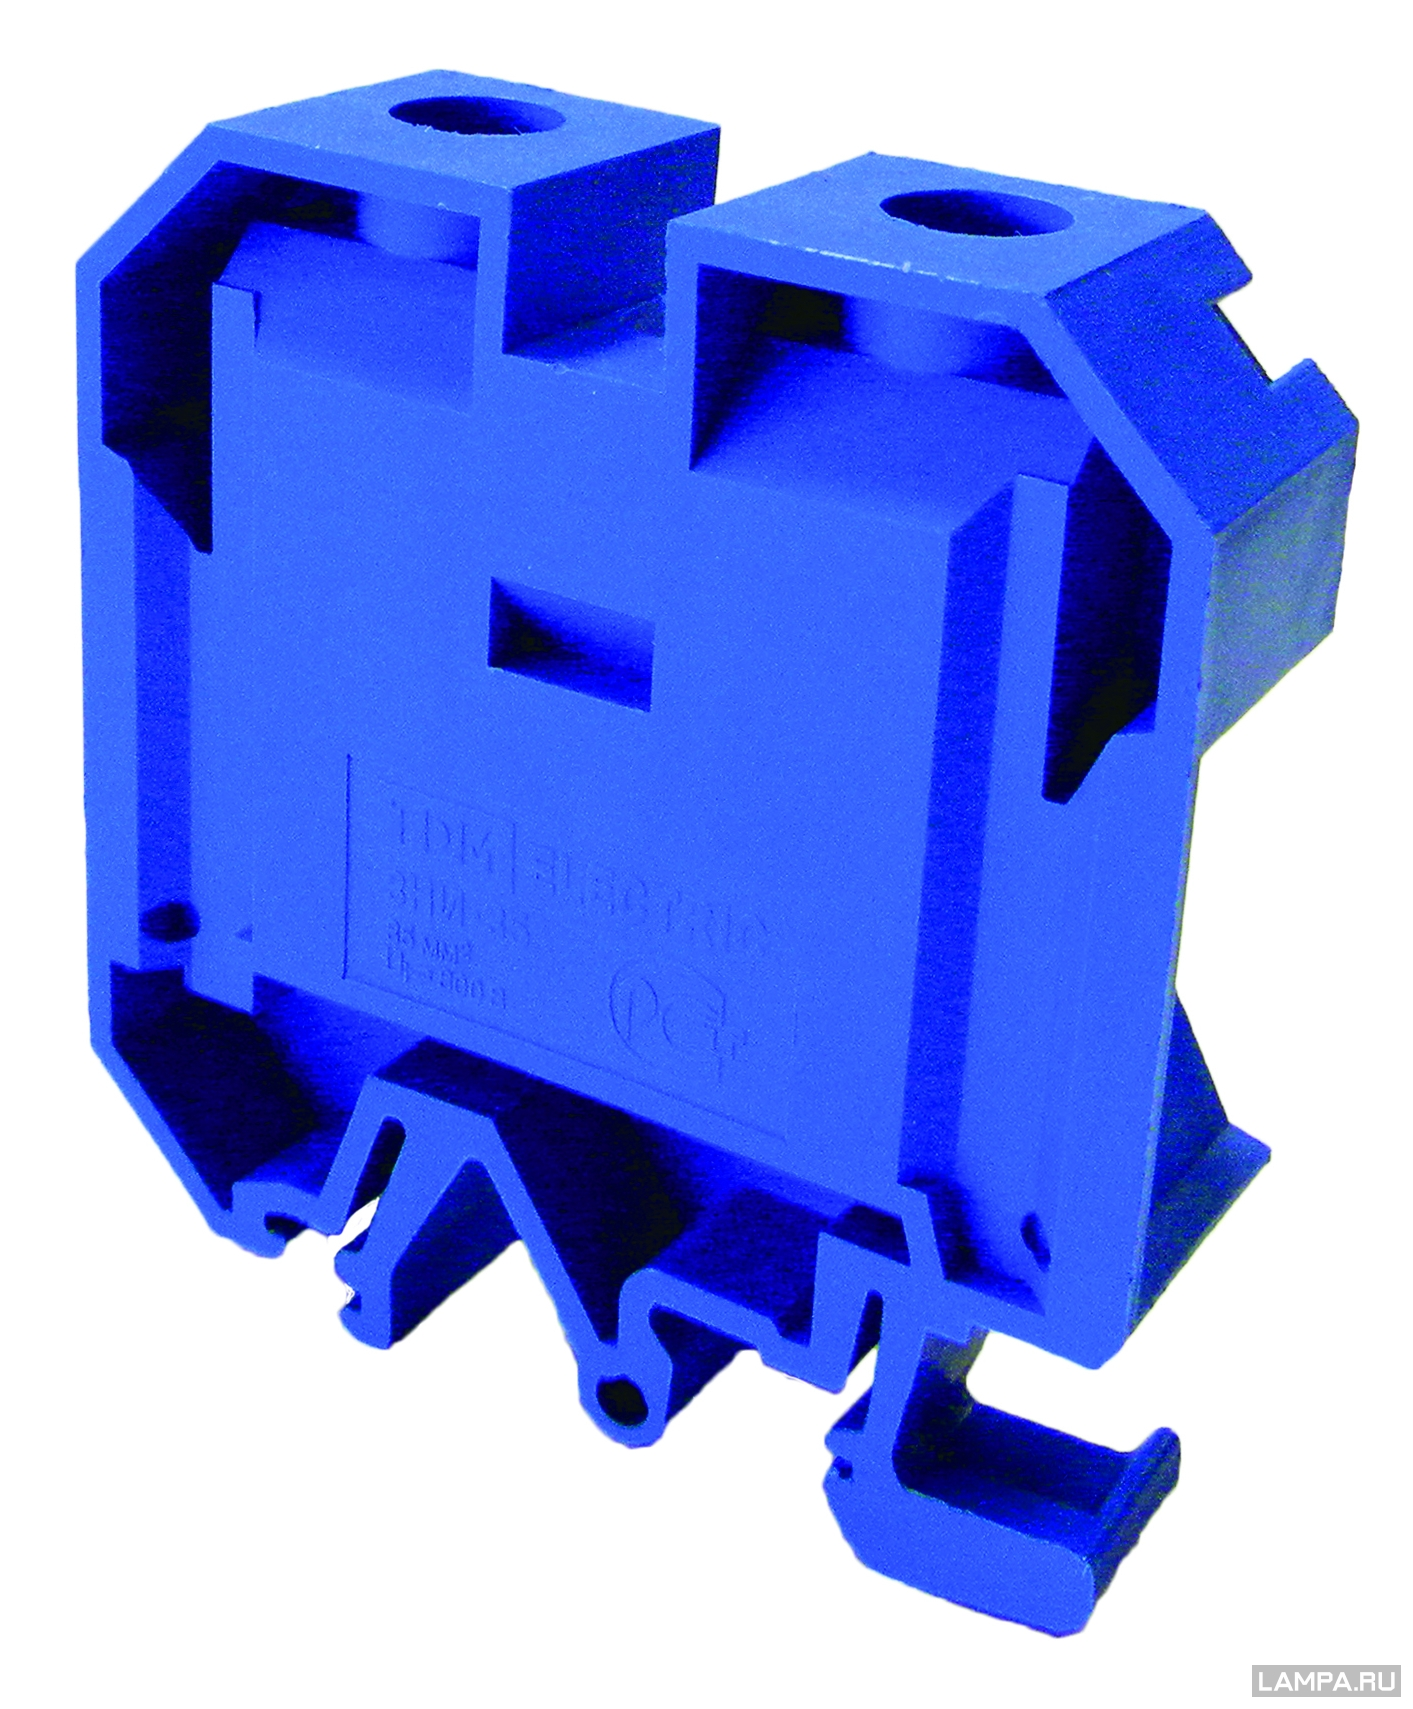 Зажим наборный Tdm Sq0803-0006 tdm electric smd5050 60 20 12 144 3200 ip20 sq0331 0006